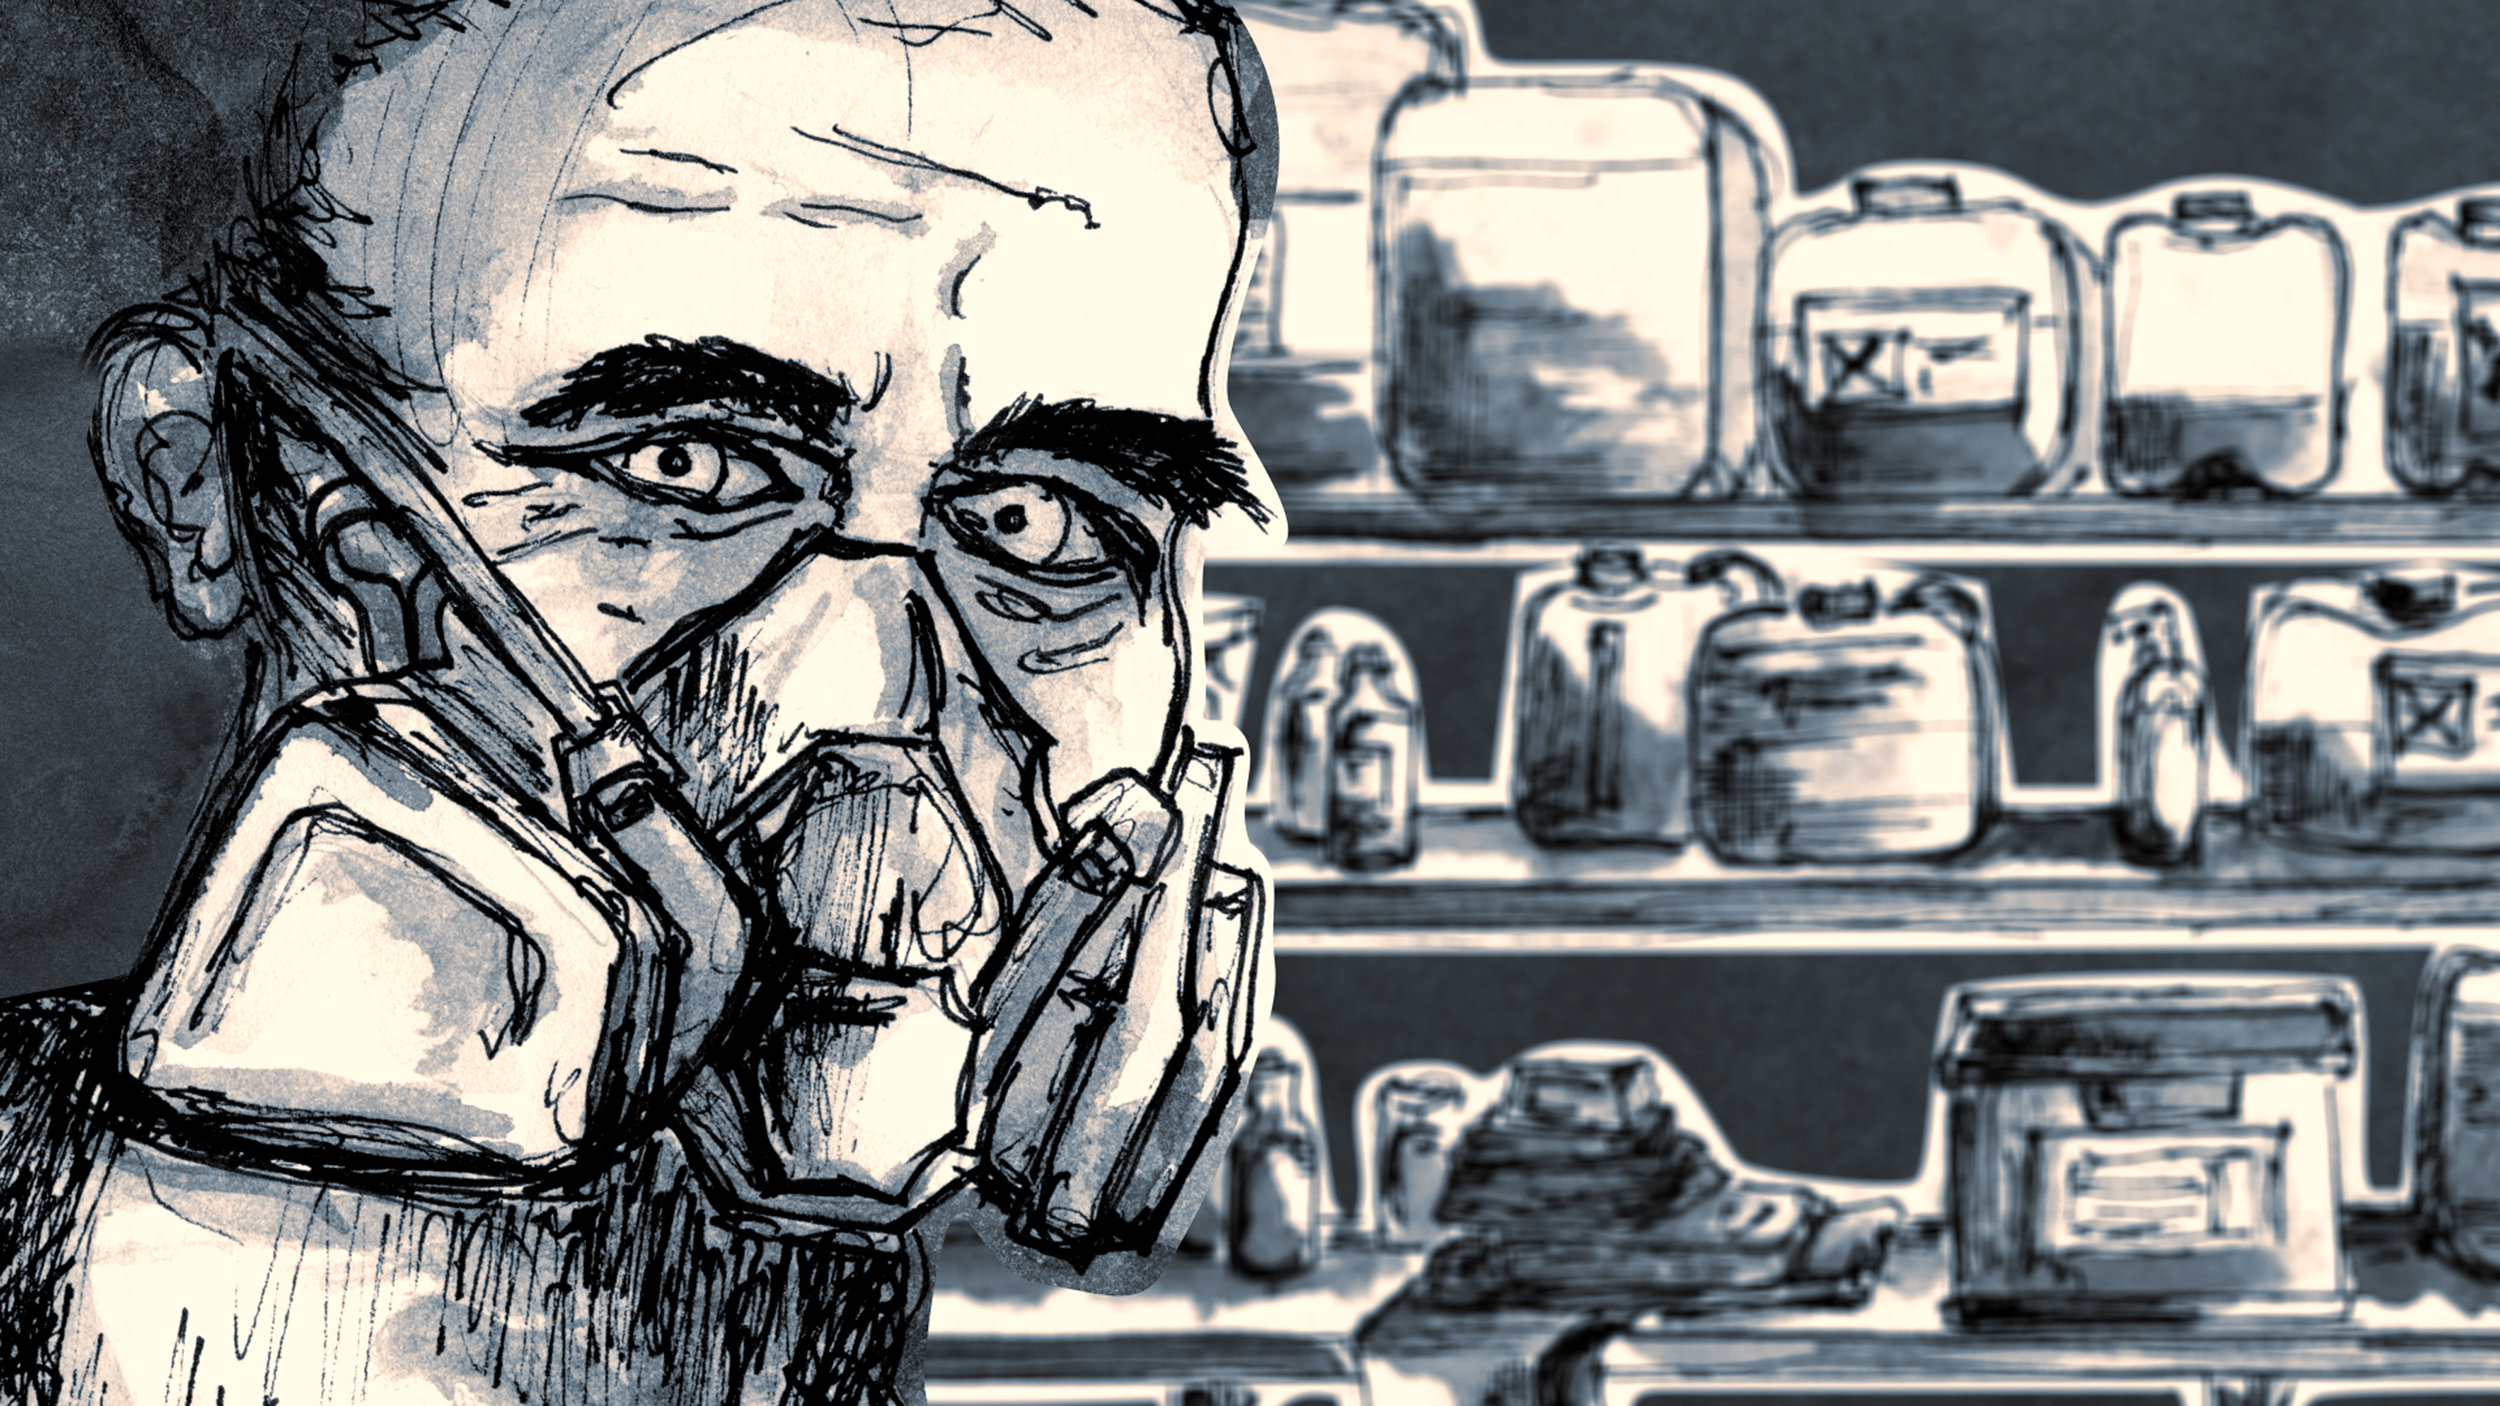 - 作品名称:《最后的踪迹》导演:奥利弗·罗杰斯、诺伯特·科特曼制片:菲利普·波那契国家 / 地区:瑞士创作时间:2013 编剧:奥利弗·罗杰斯、诺伯特·科特曼音乐:罗珊娜·泽恩德片长:6 分 31 秒Title: Last Traces (Letzte Spuren)Director: Oliver Rogers, Norbert KottmannProducer(s): Filippo Bonacci Country/Area: Switzerland Year of production: 2013 Screenplay: Oliver Rogers, Norbert KottmannMusic: Rosanna ZuendLength: 6 mins 31 secs作品介绍如果一具尸体悄无声息地消失了好几天,甚至几周会怎么样呢?尸体会有什么样的变化,发现尸体的地方又是如何呢?斯文·格罗斯曼就专门处理这些问题,而且以清理死亡现场的工作为生。Synopsis What happens after a corpse has gone unnoticed for days or even weeks? How does the body react and what happens to the place the body was found? Sven Grossmann deals with these types of questions and has made a living from cleaning up after death.